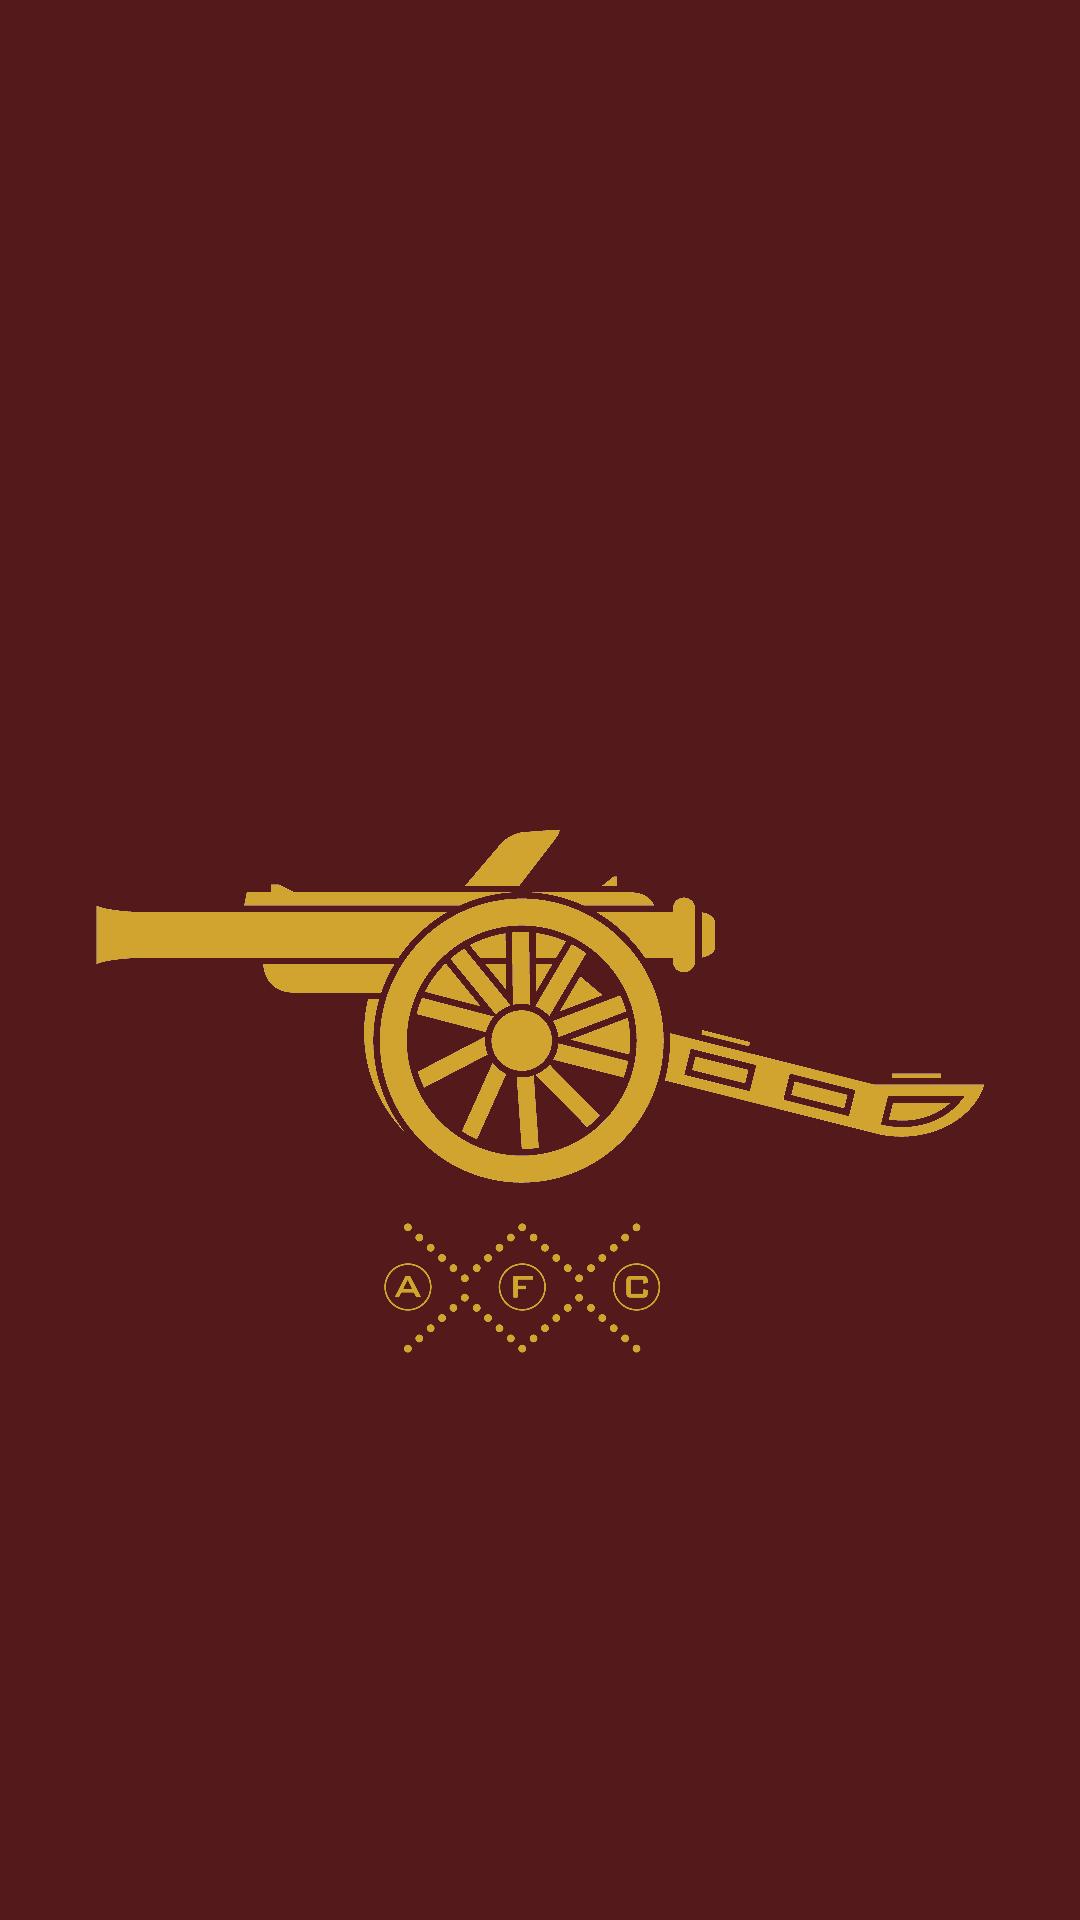 Emirates Wallpaper Hd Arsenal Logo Hd Wallpaper For Mobile Pixelstalk Net